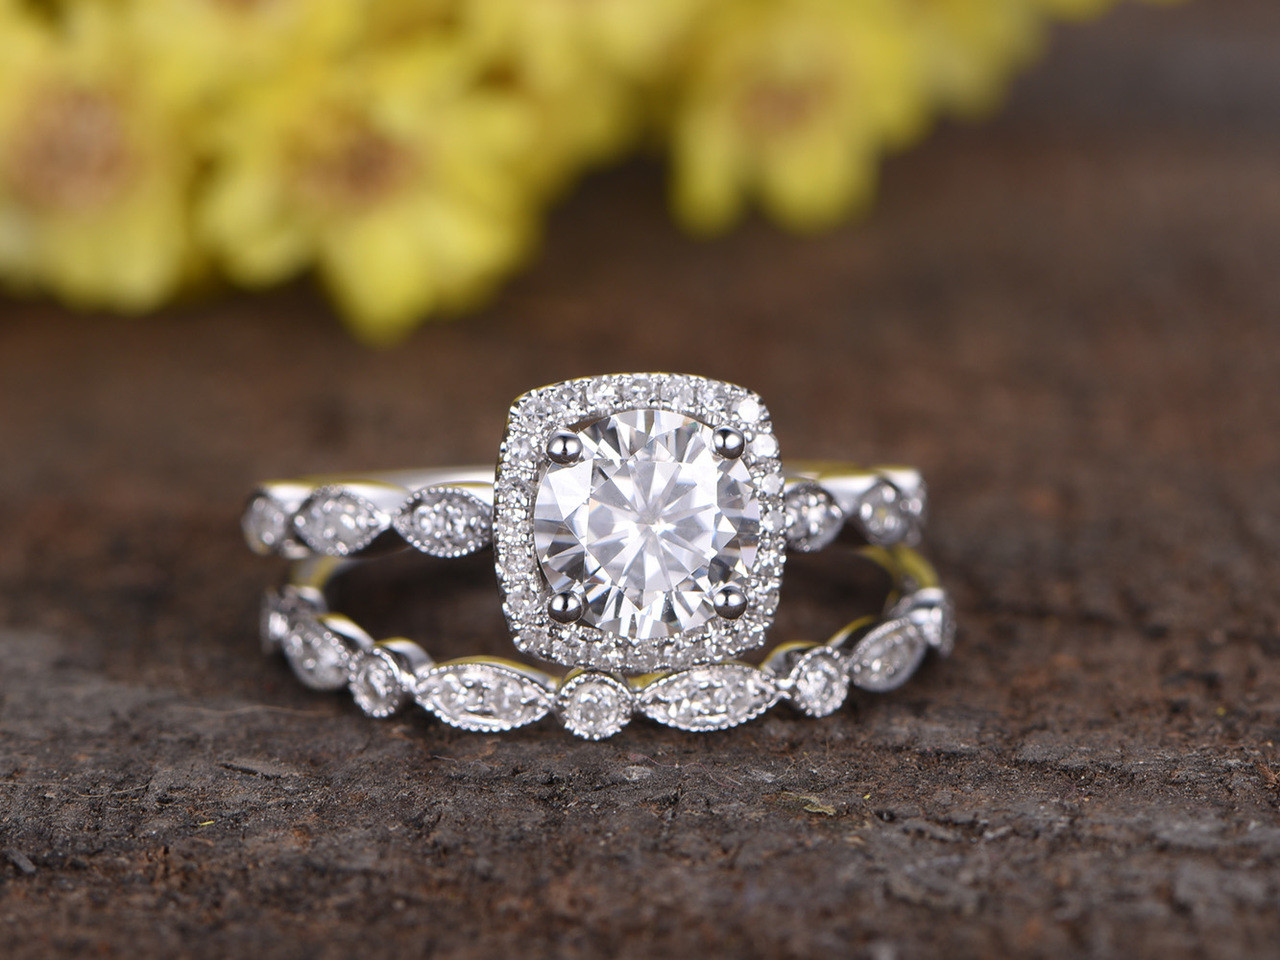 1 Carat Round Moissanite Wedding Ring Sets Diamond Art Deco Matching Band  14k White Gold Cushion